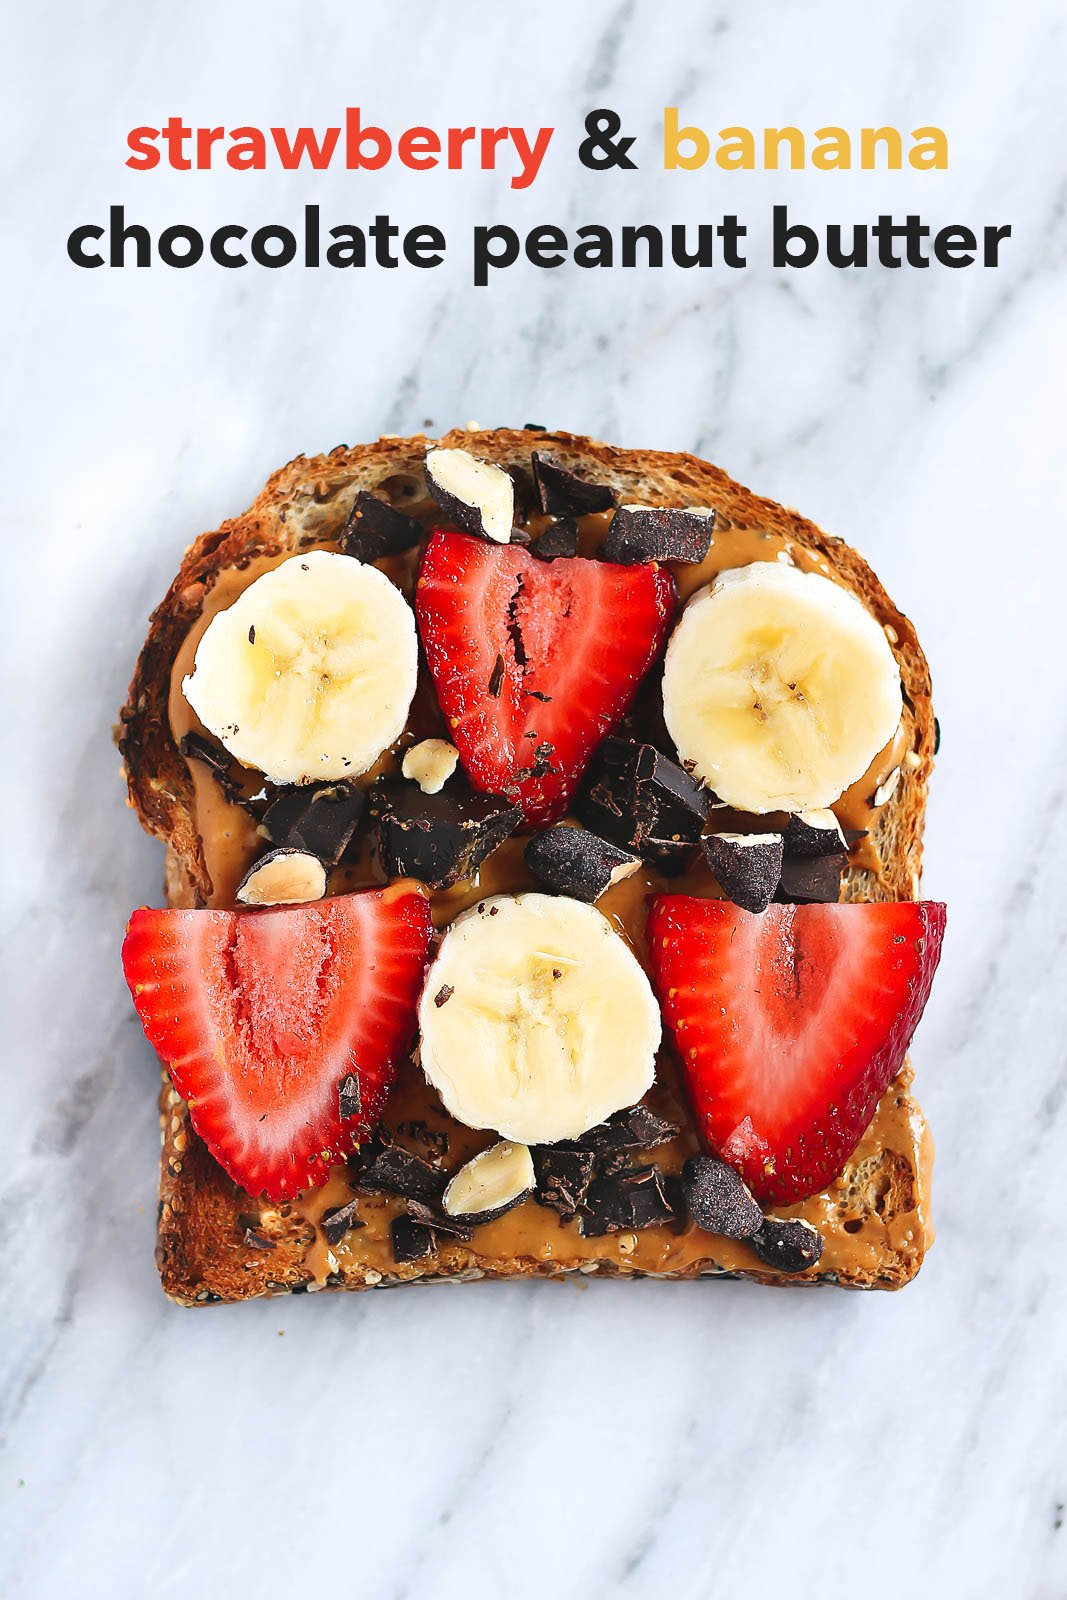 breakfast toast goals. strawberry, peanut butter, banana and dark chocolate chunks